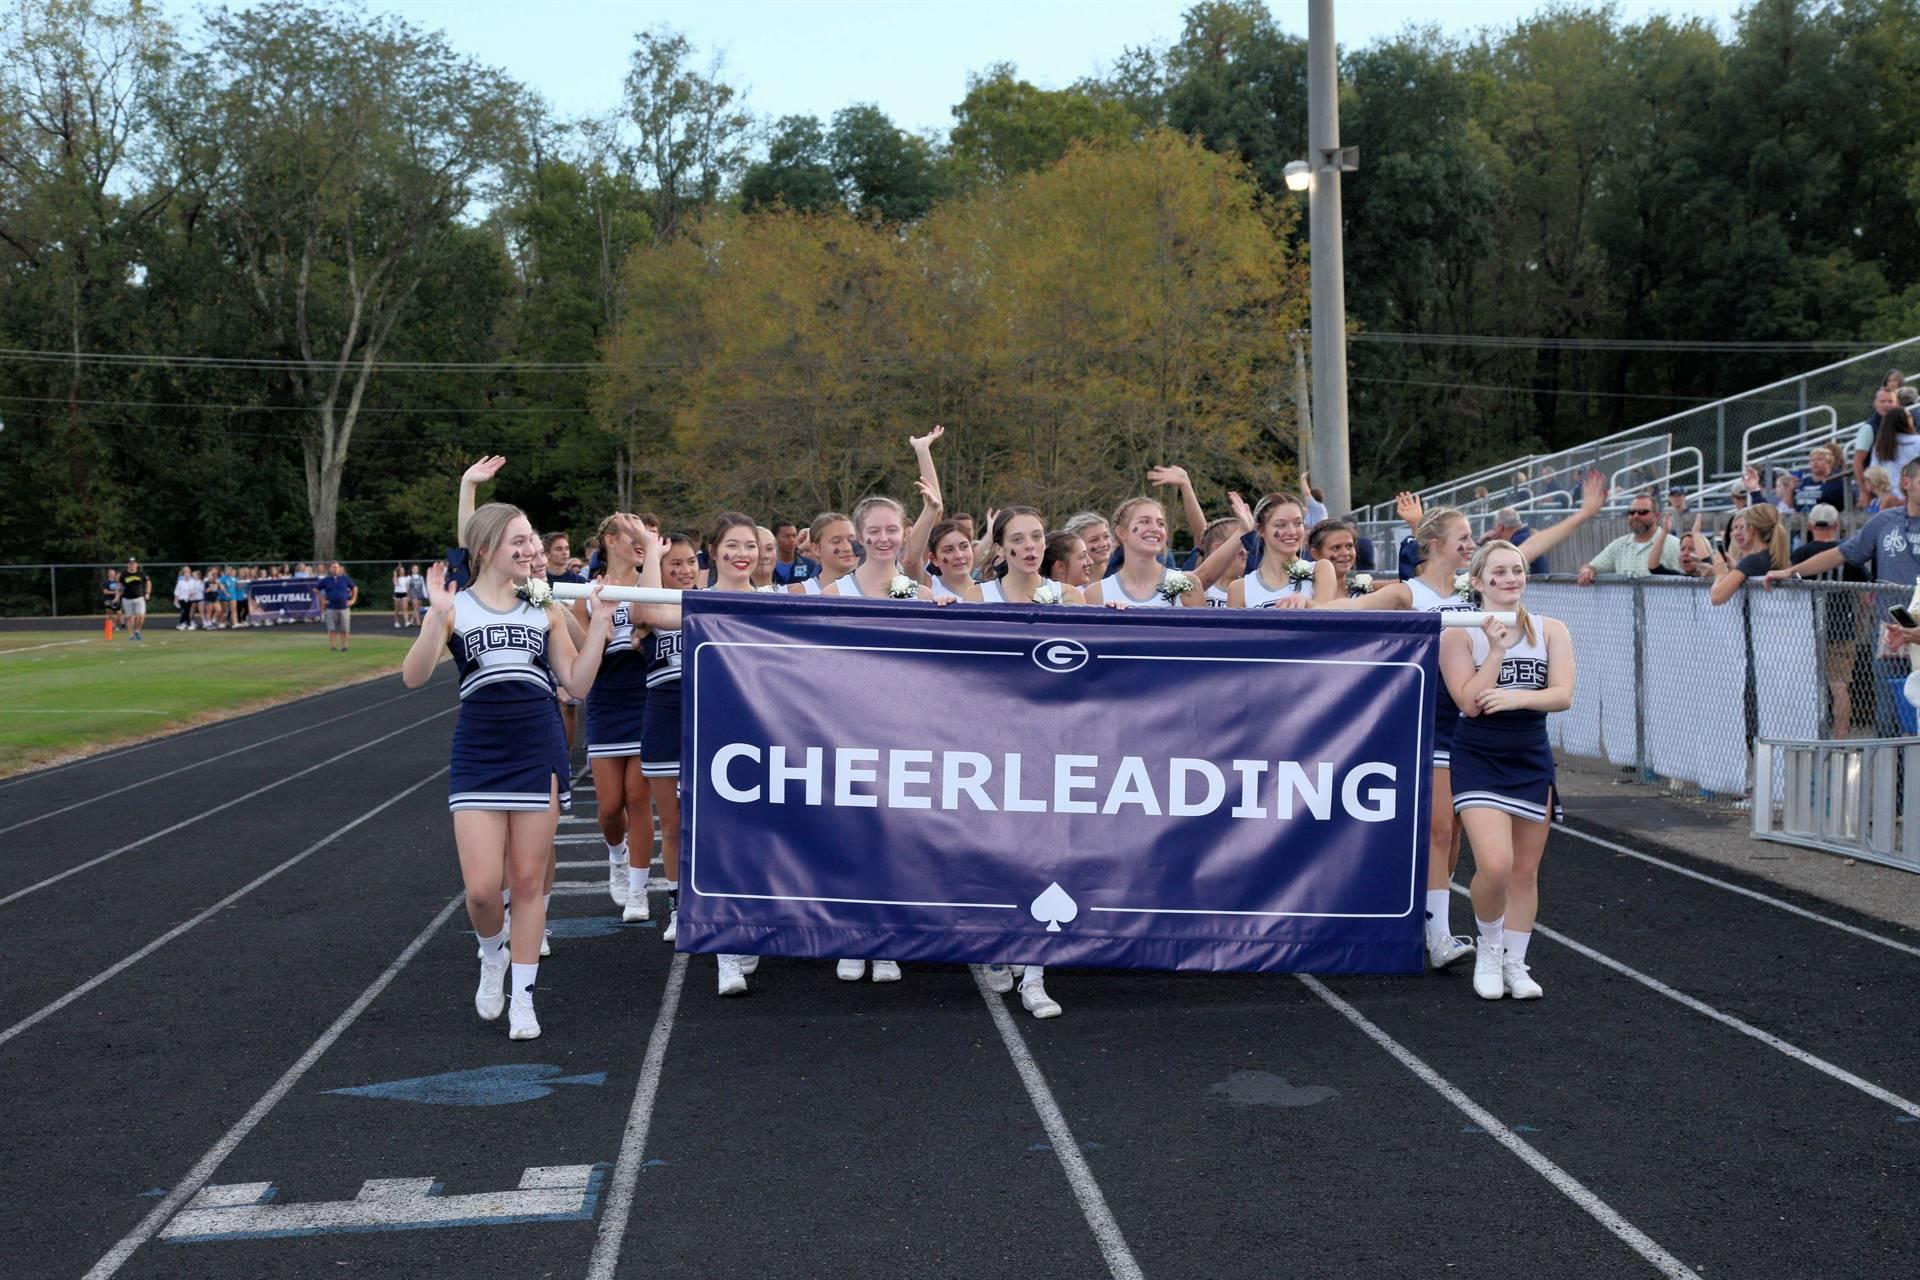 Cheerleaders in Homecoming Parade